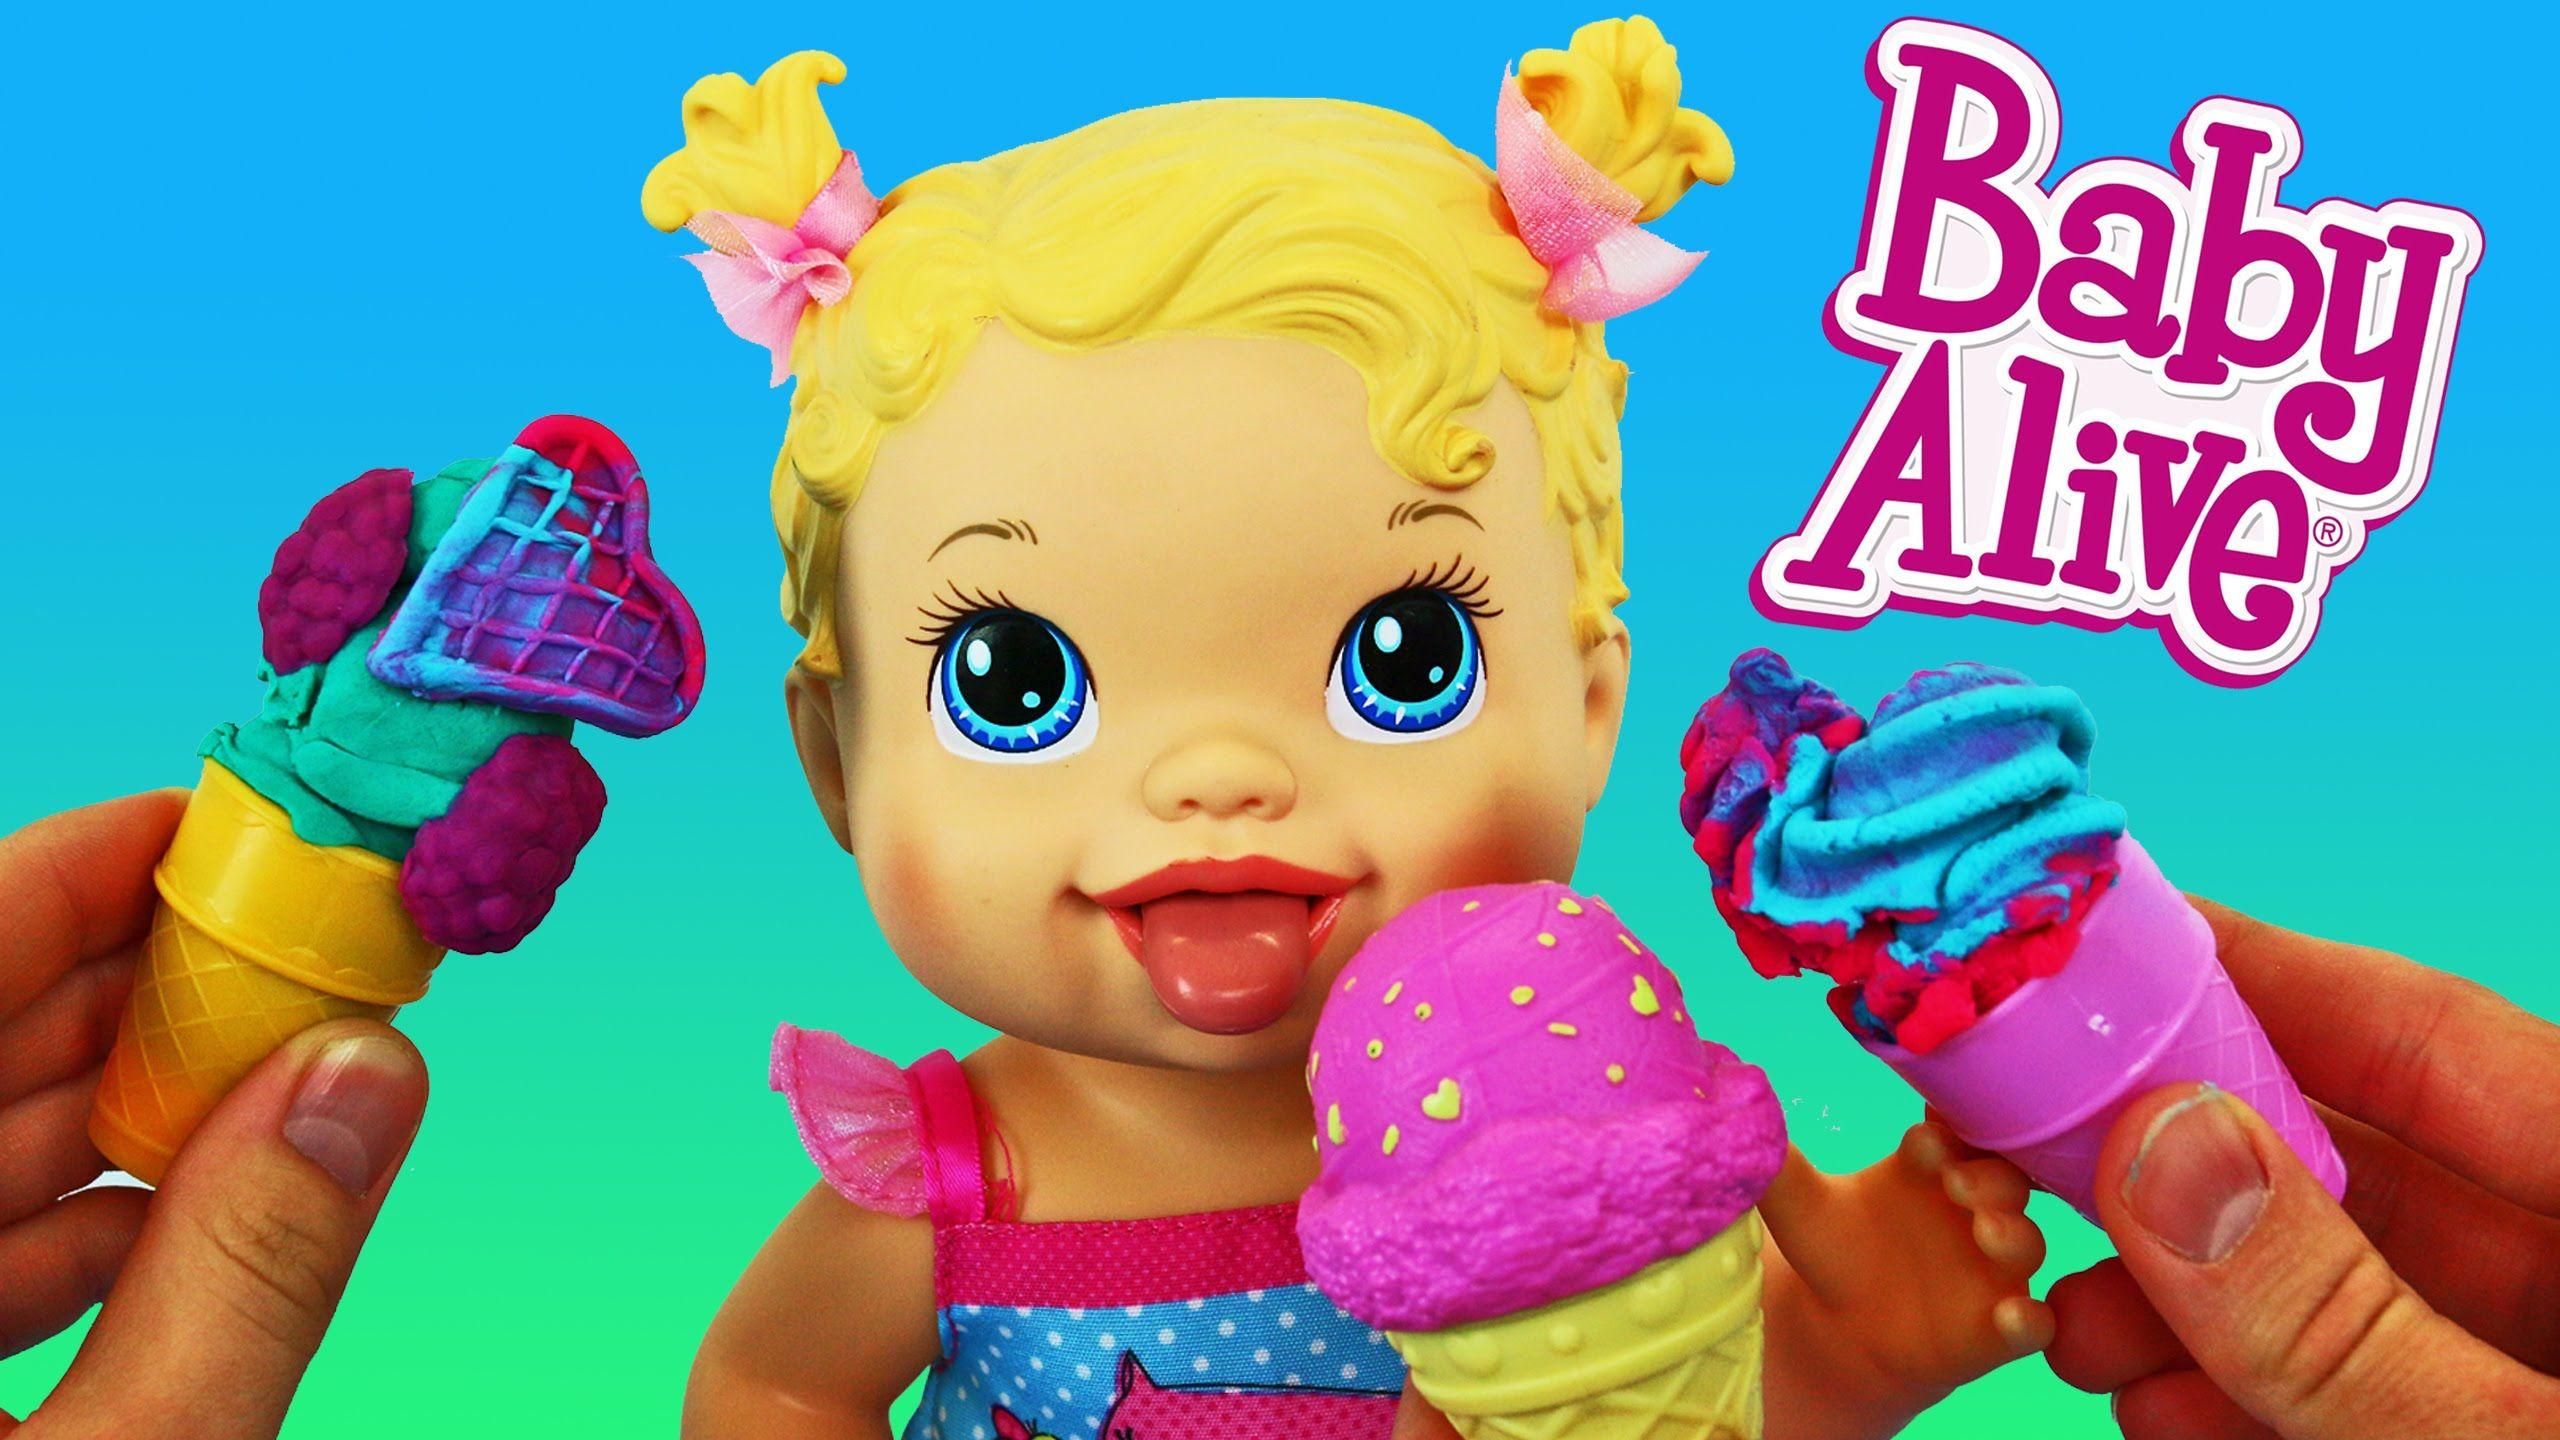 Baby Alive Yummy Treat Baby Doll Licks Eats Play Doh Ice Cream Cones By Disneycartoys Baby Alive Baby Dolls Play Doh Ice Cream